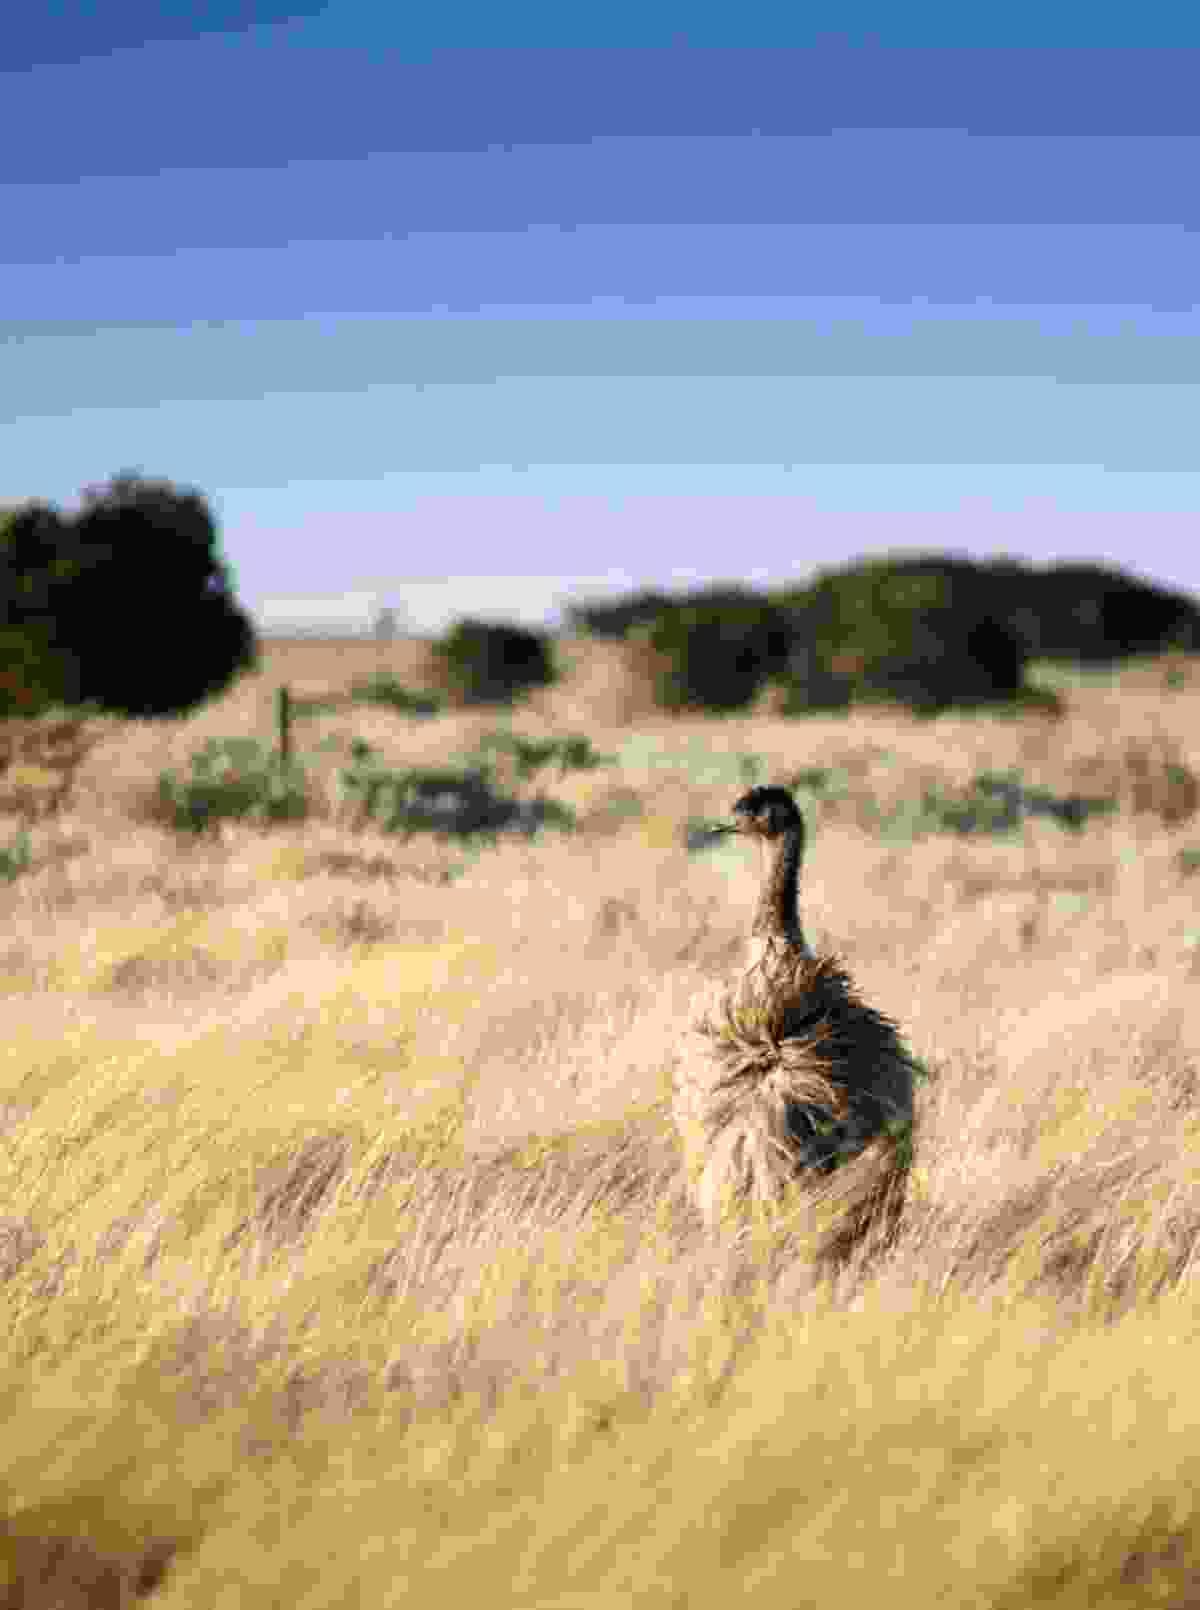 Emu in the Australian outback (Dreamstime)